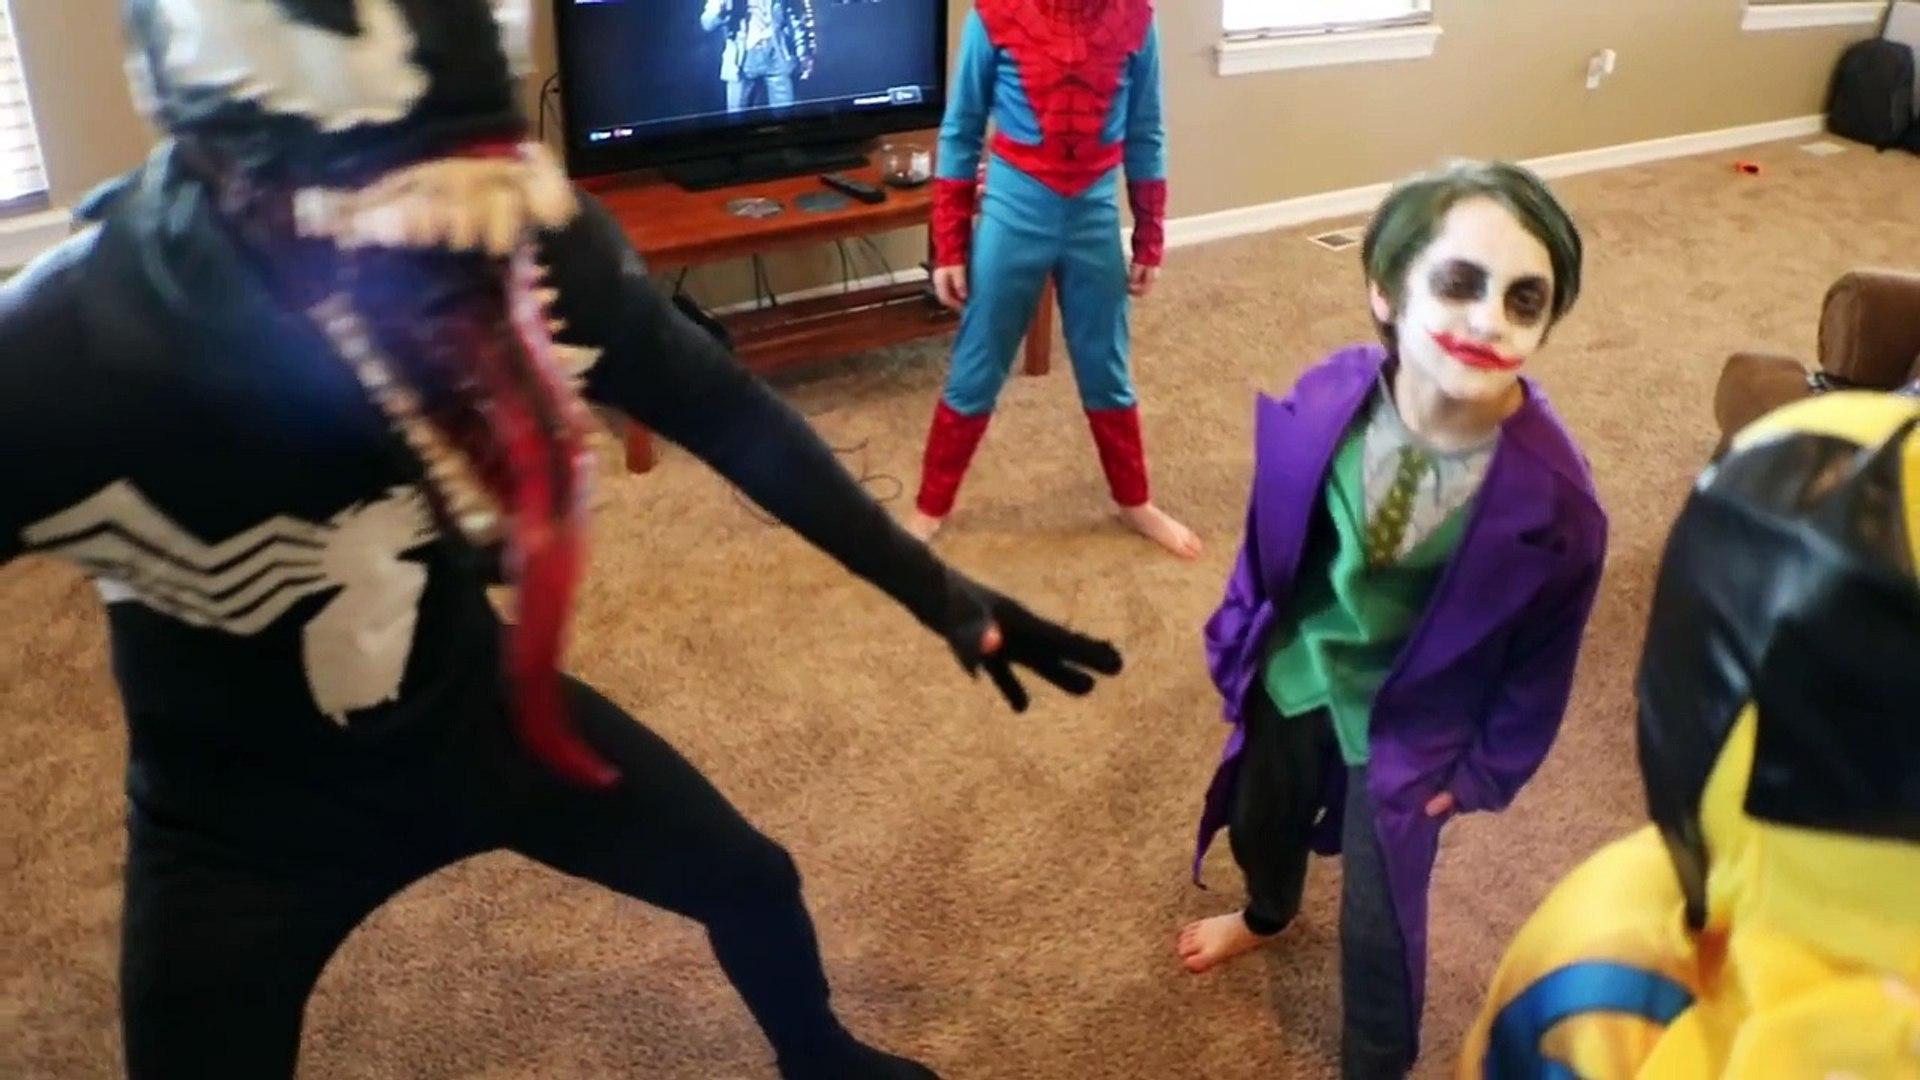 The Joker Venom Vs Spiderman Wolverine In Real Life Minecraft Sword Battle Superhero Movie видео Dailymotion